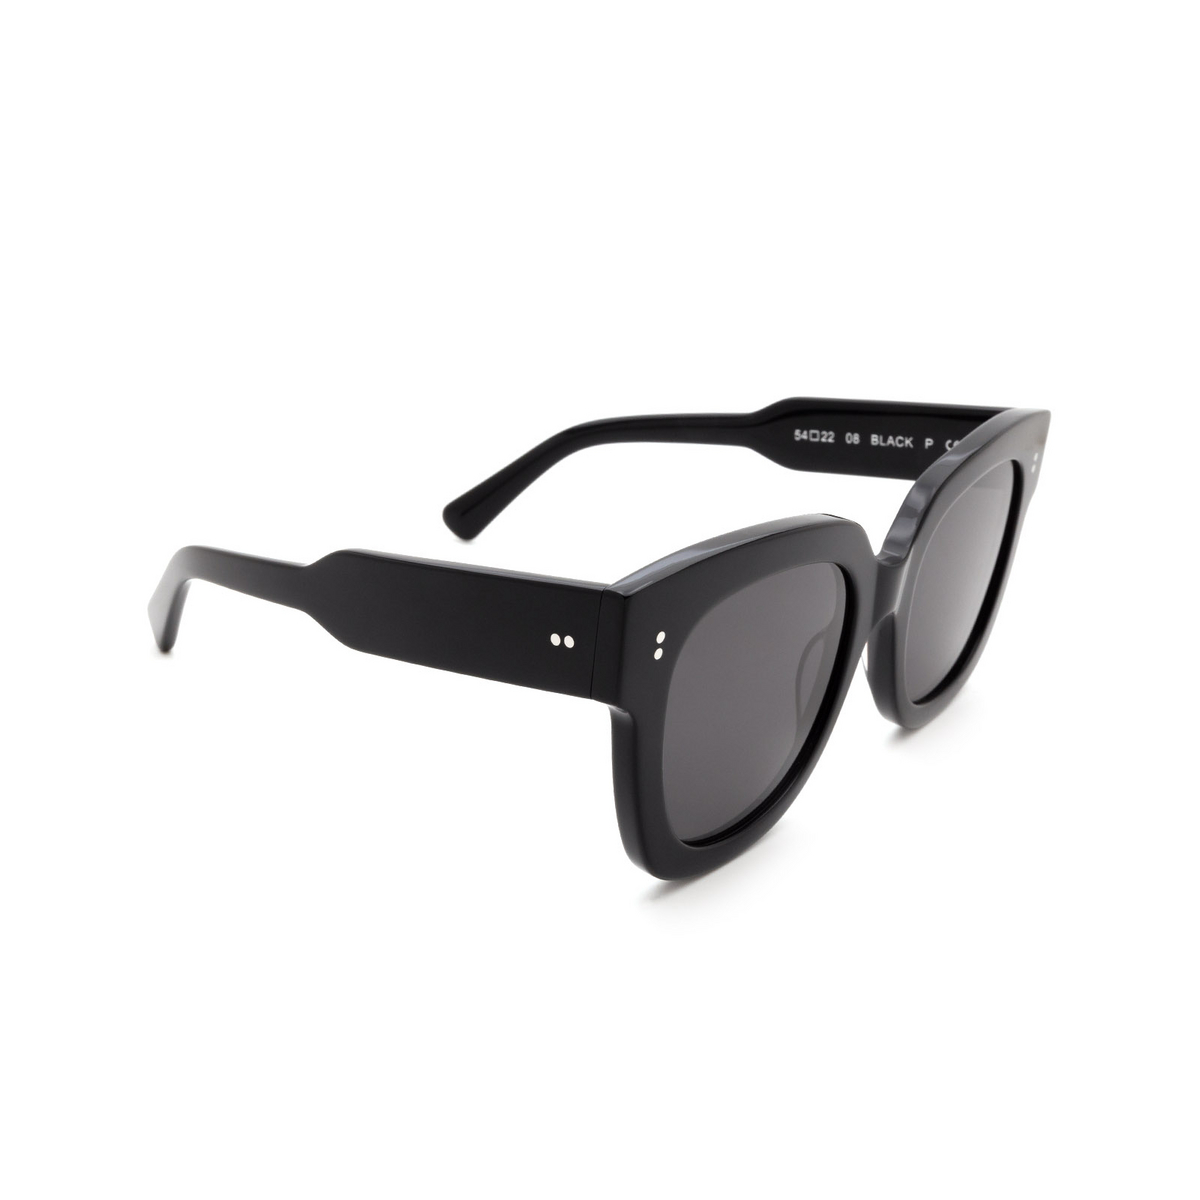 Chimi® Square Sunglasses: 08 color Black - three-quarters view.